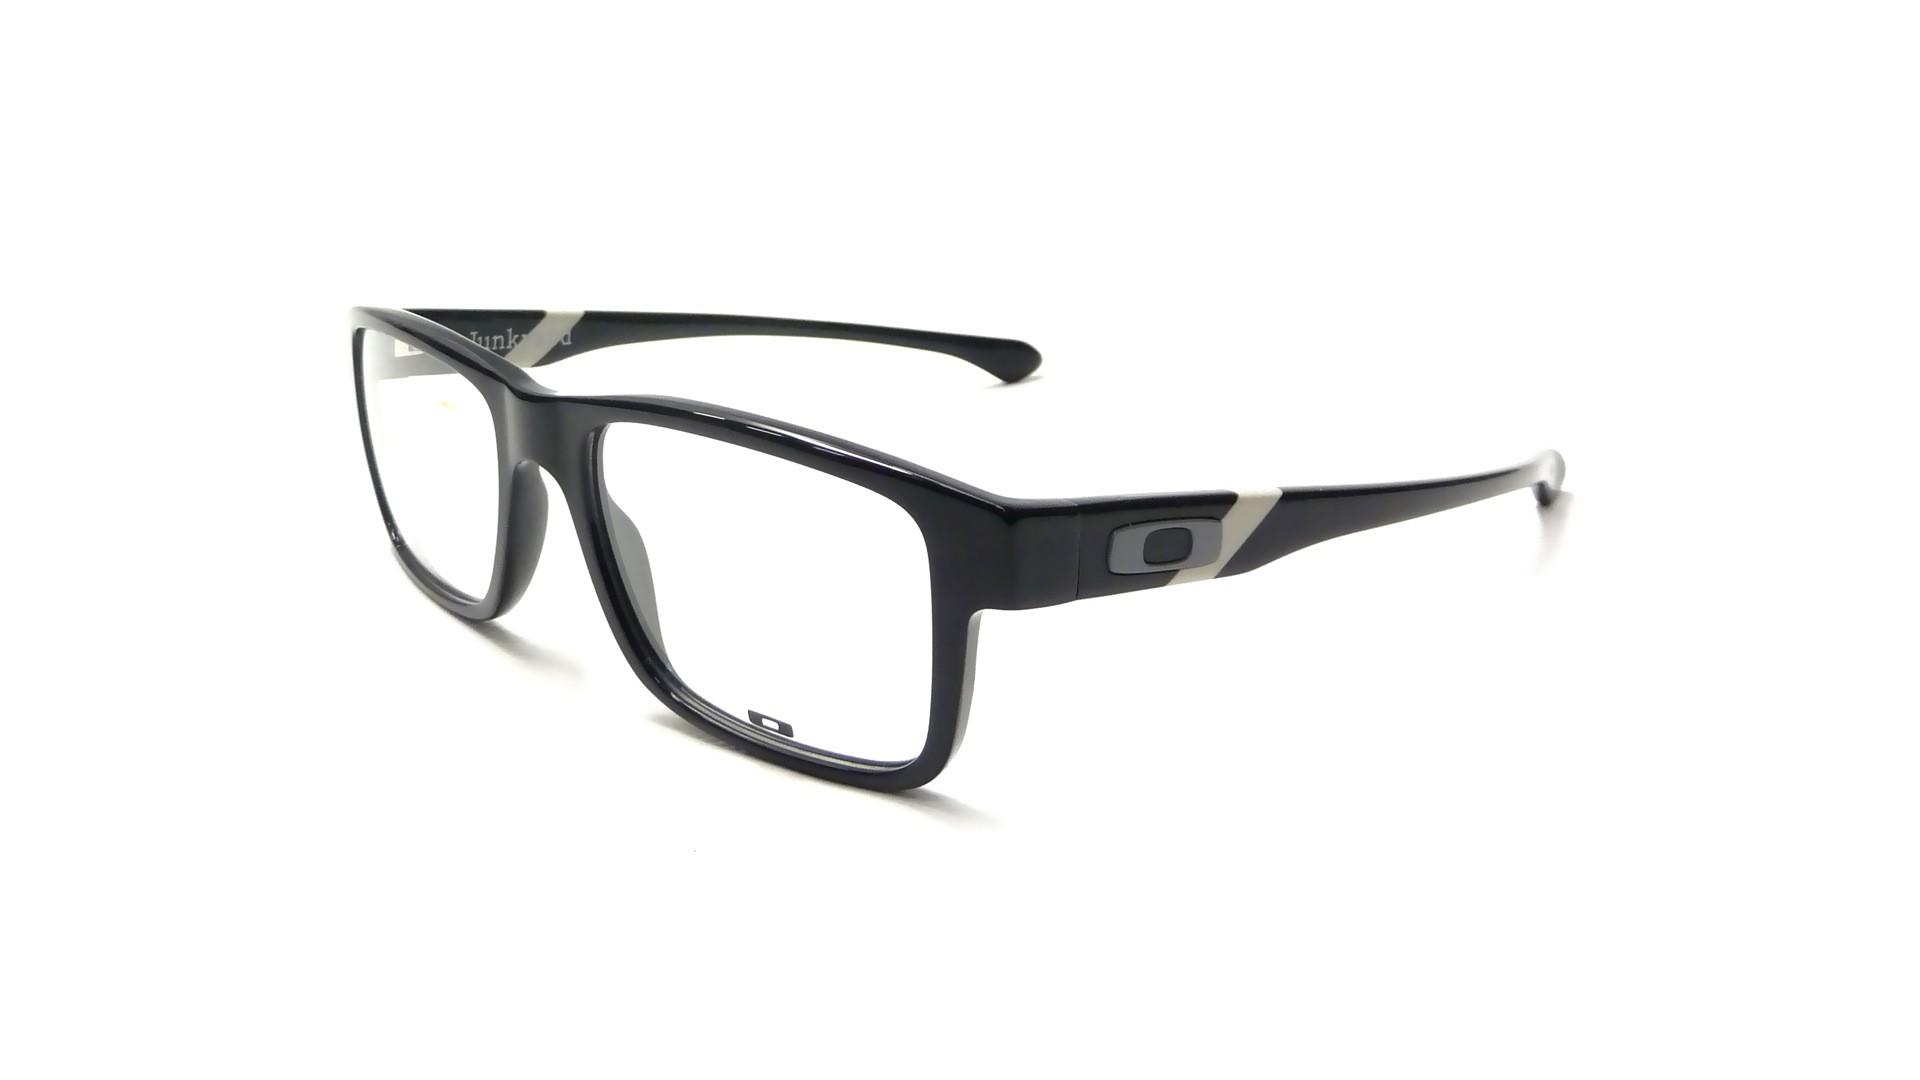 oakley eyeglasses ej3y  Oakley Junkyard Black OX1074 06 53-18  Visiofactory